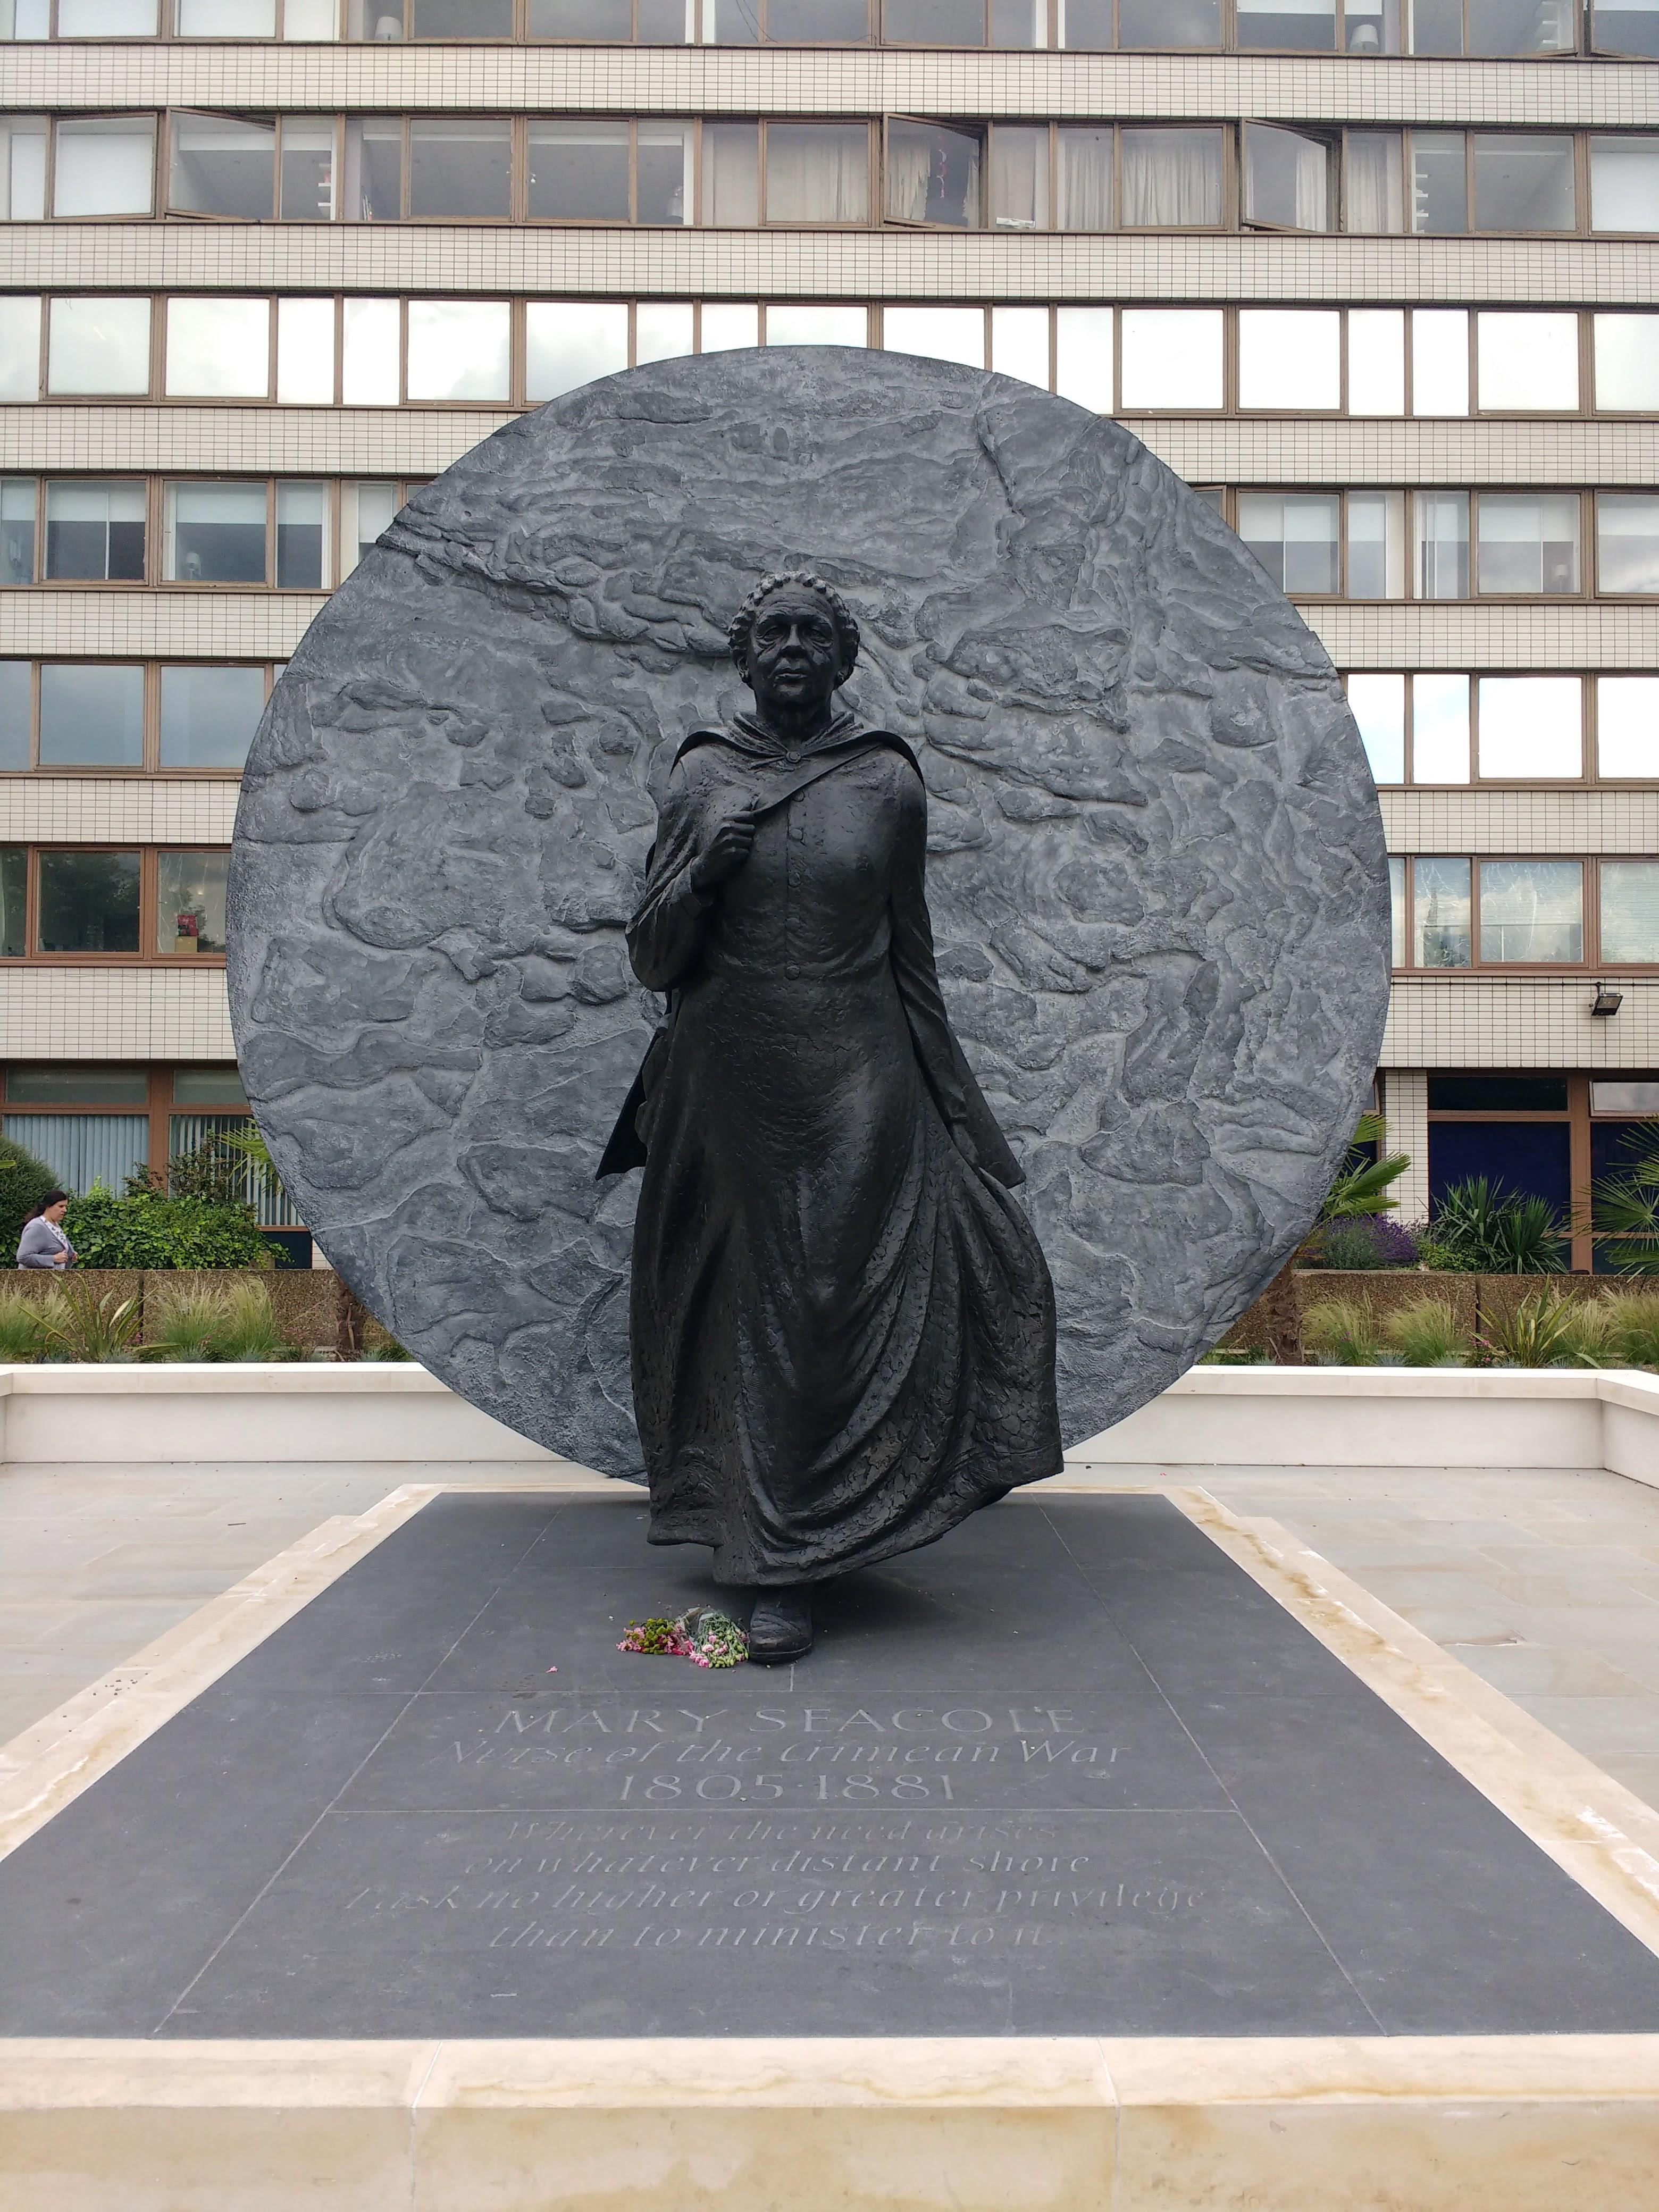 Mary Seacole statue, St Thomas' Hospital